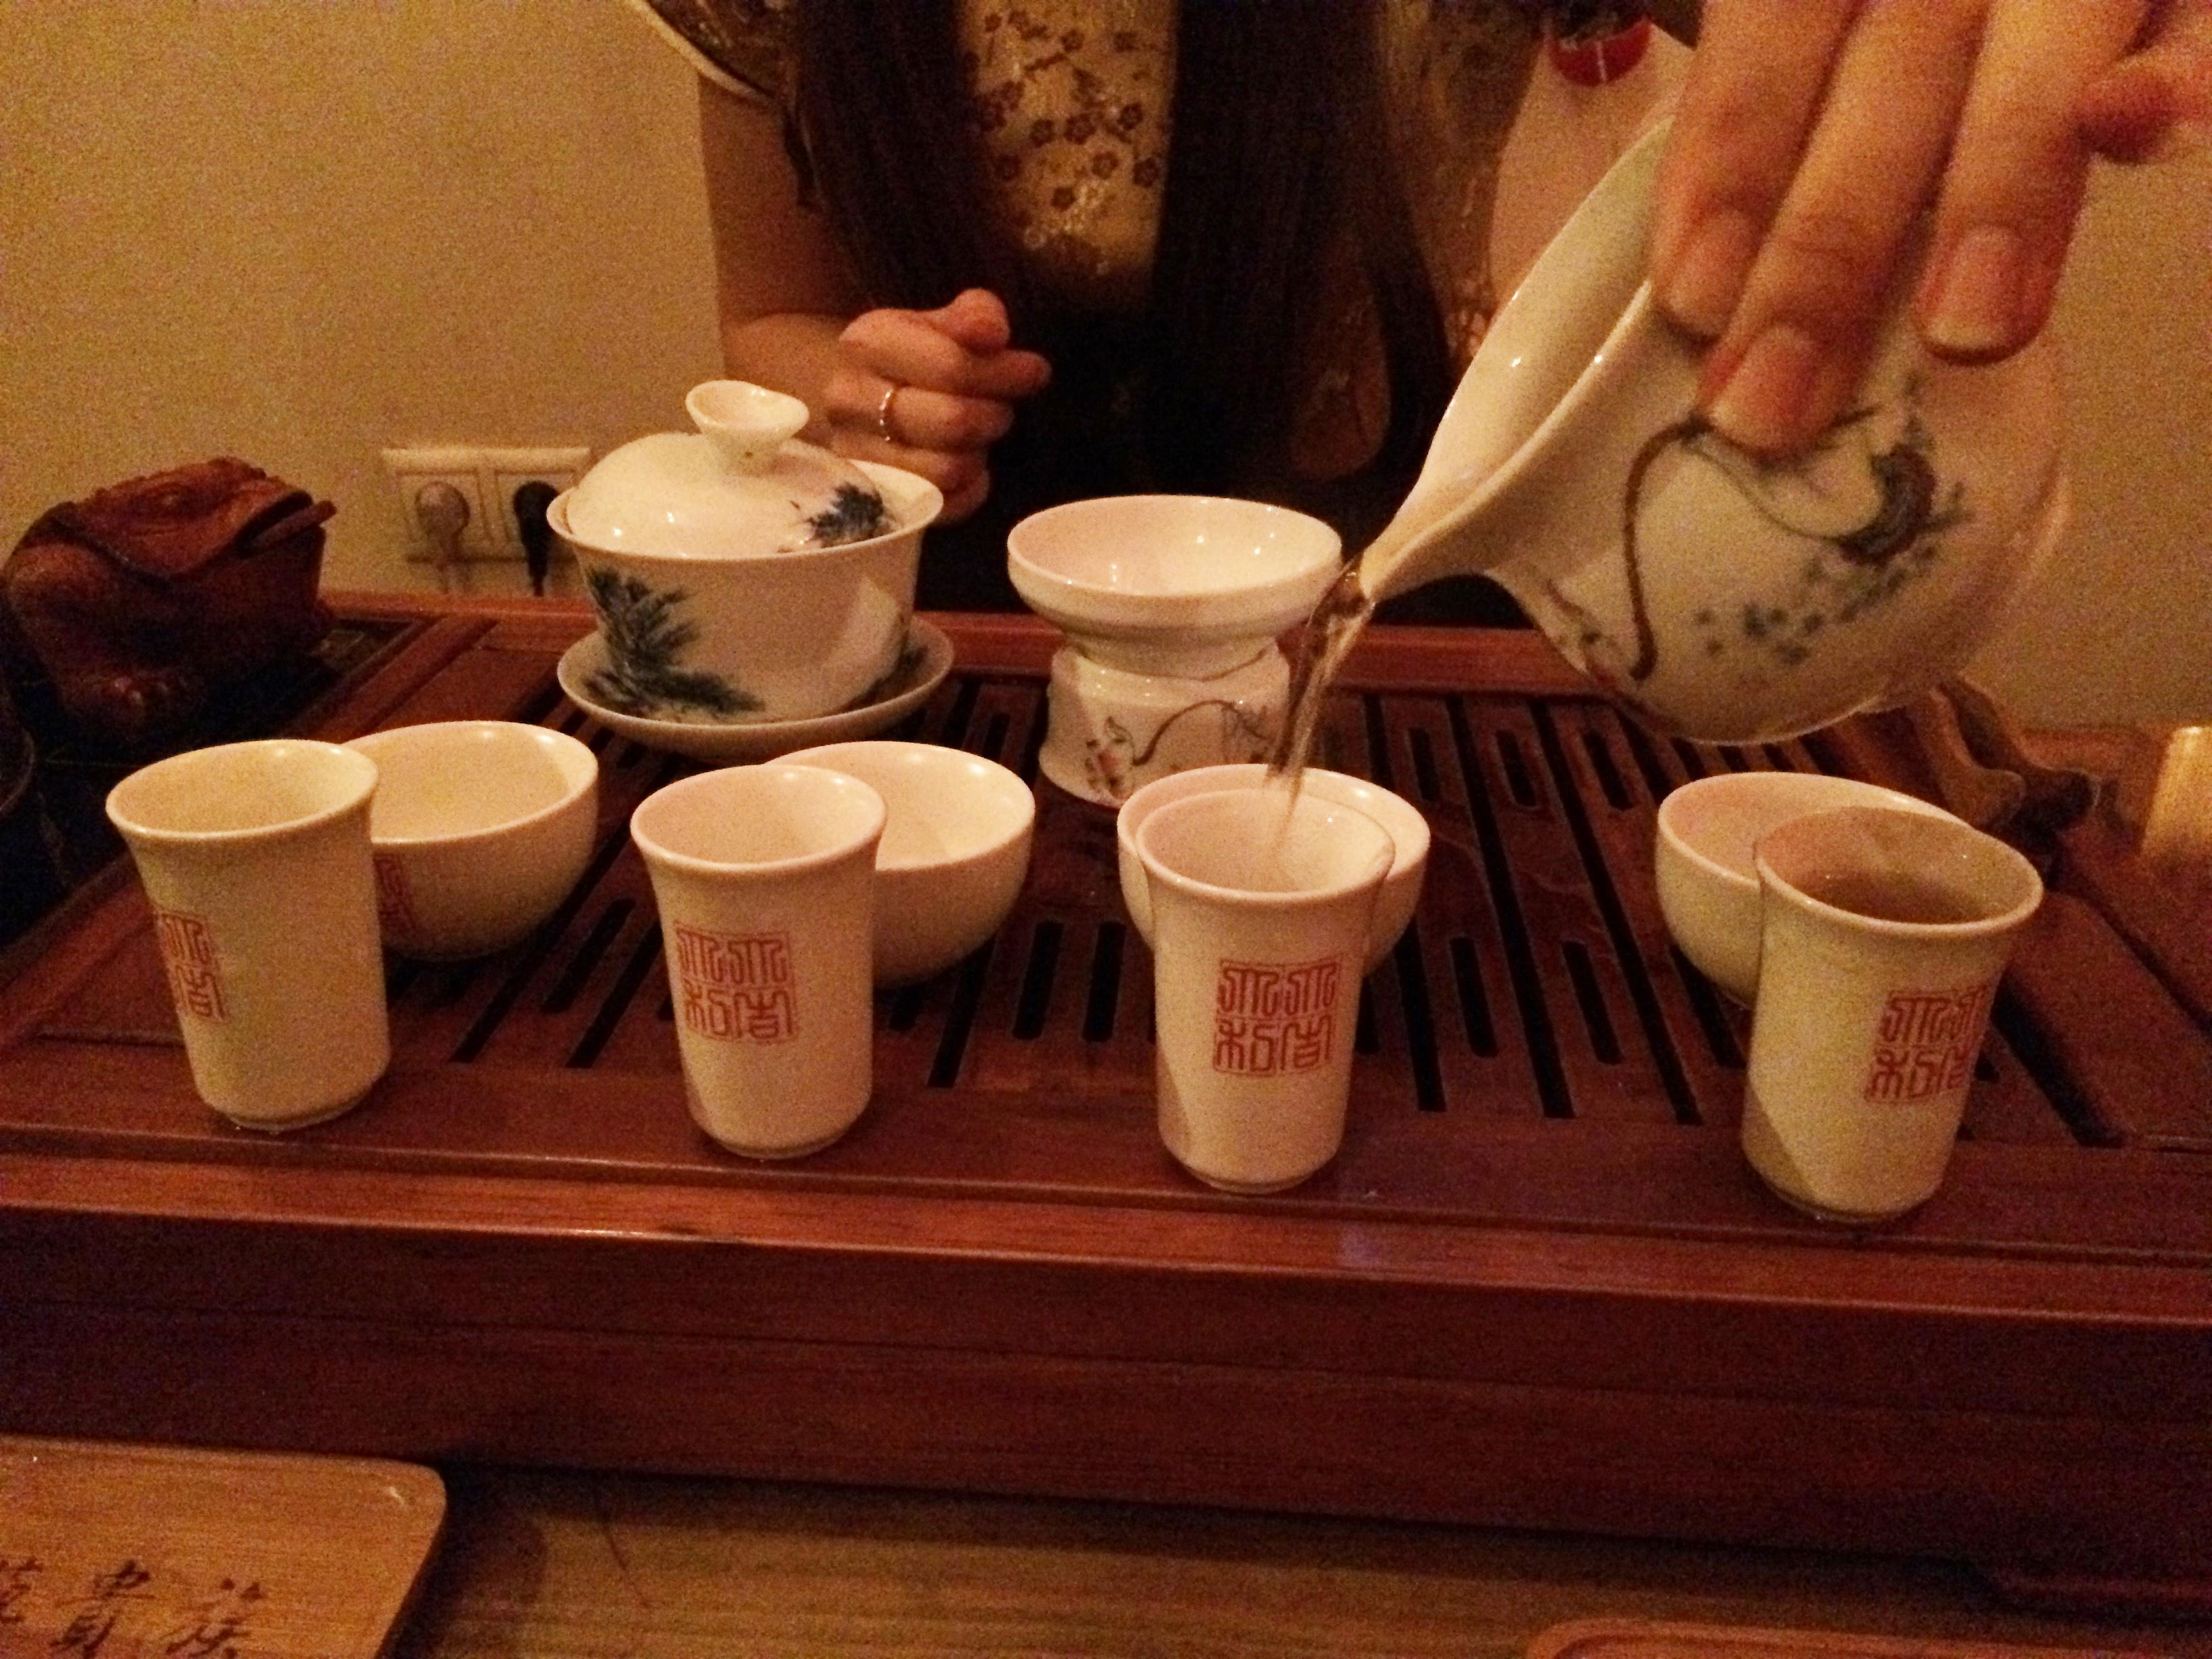 Души не чаю